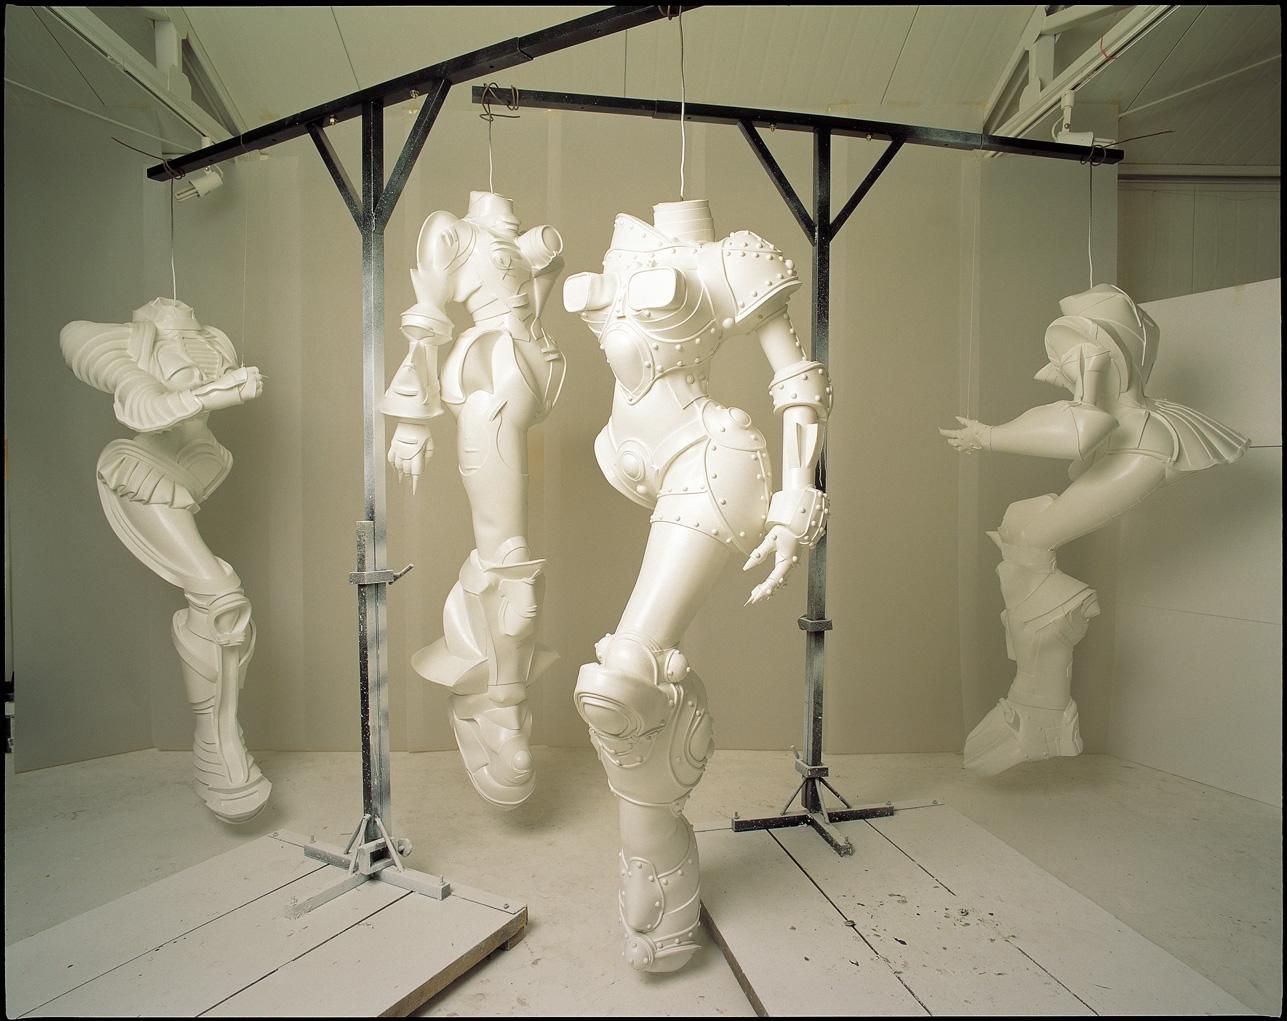 LEE BUL Cyborg W1-W4, 1998